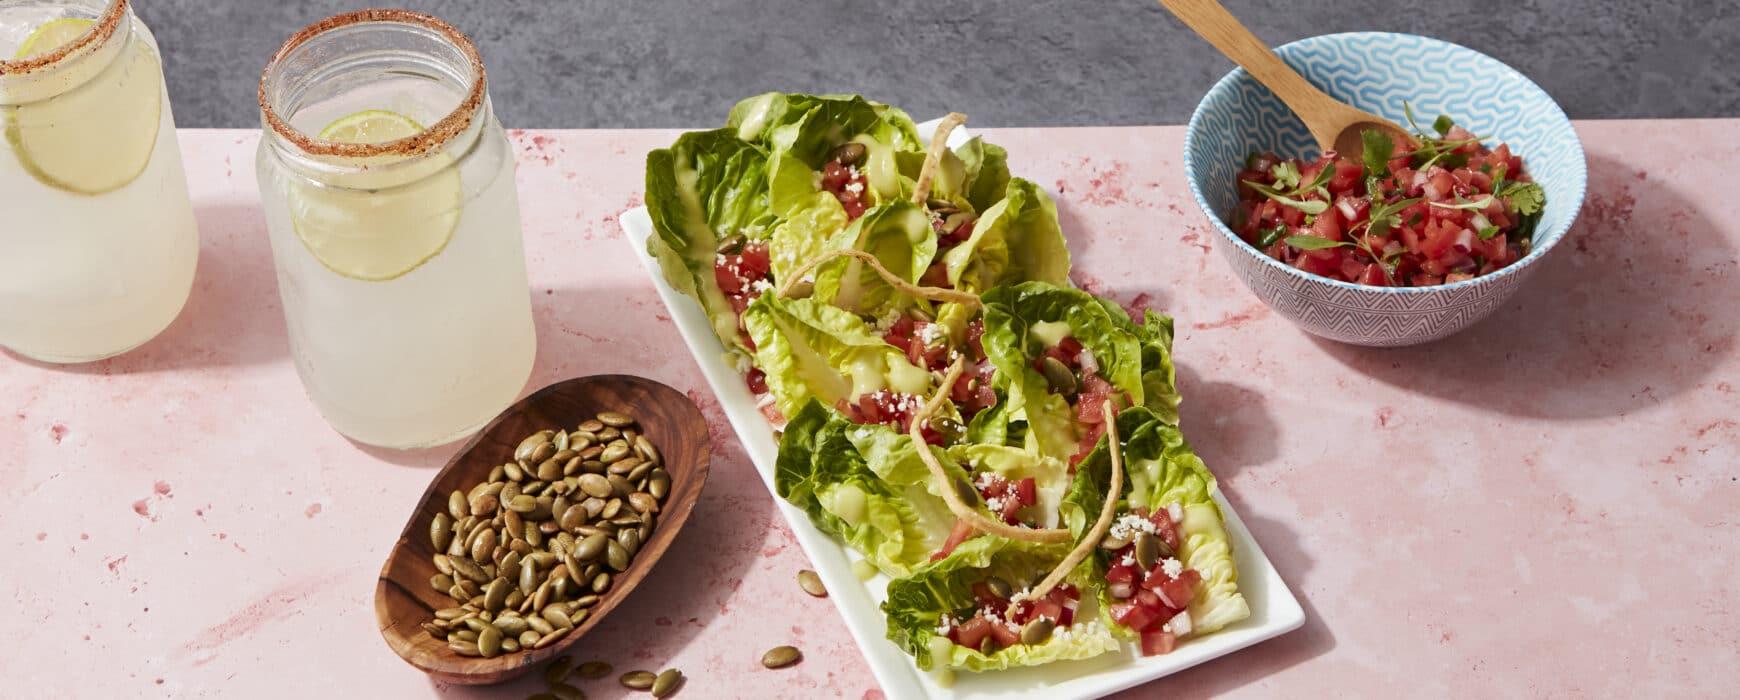 Southwestern Salad, pico de gallo, pepita, and margaritas